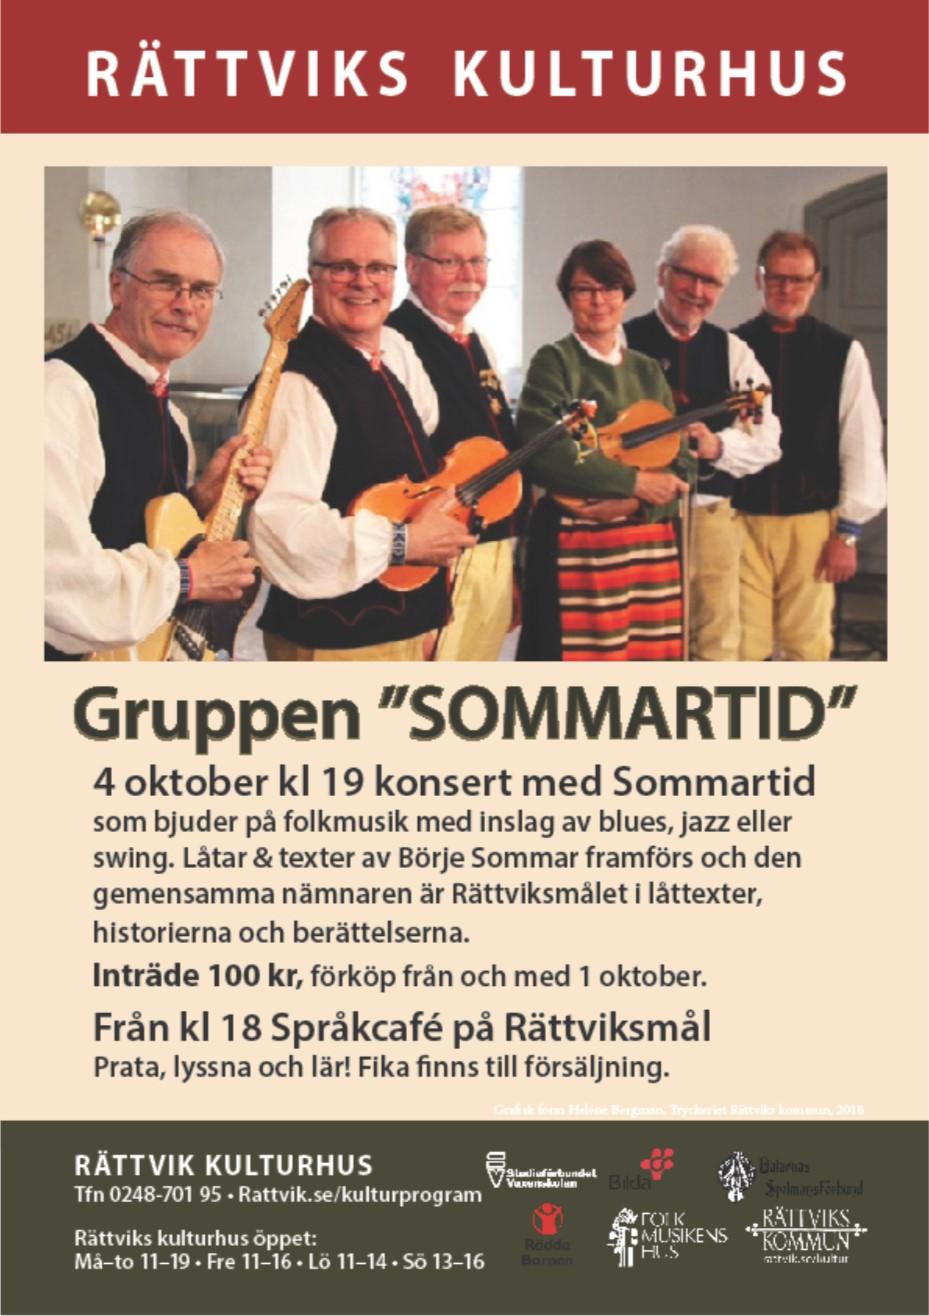 Sommartid annons 2018.jpg